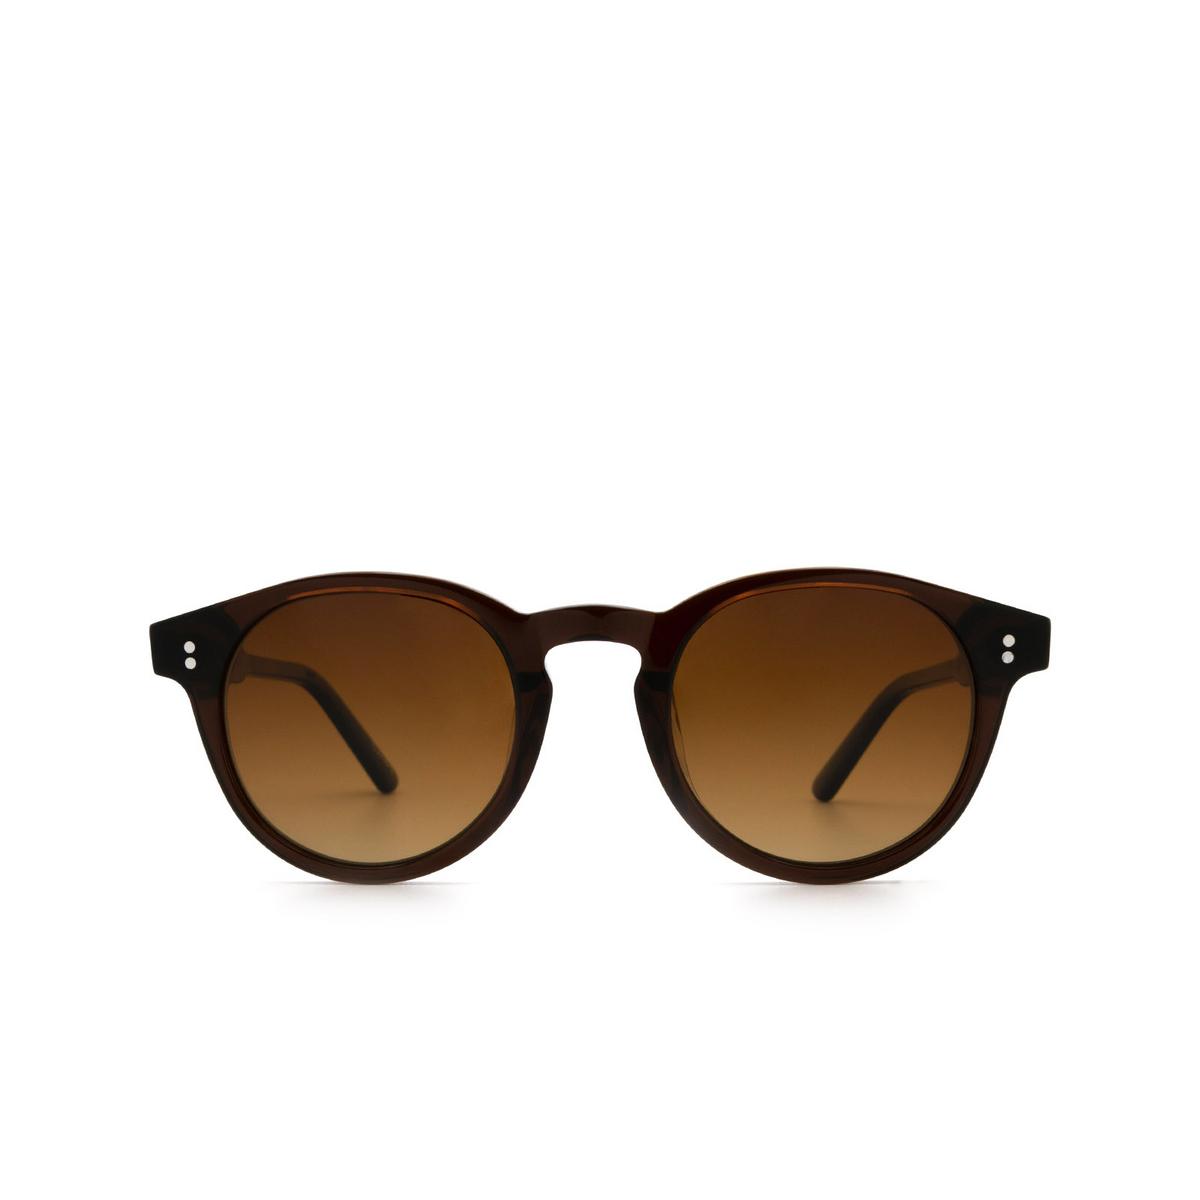 Chimi® Round Sunglasses: 03 color Brown.